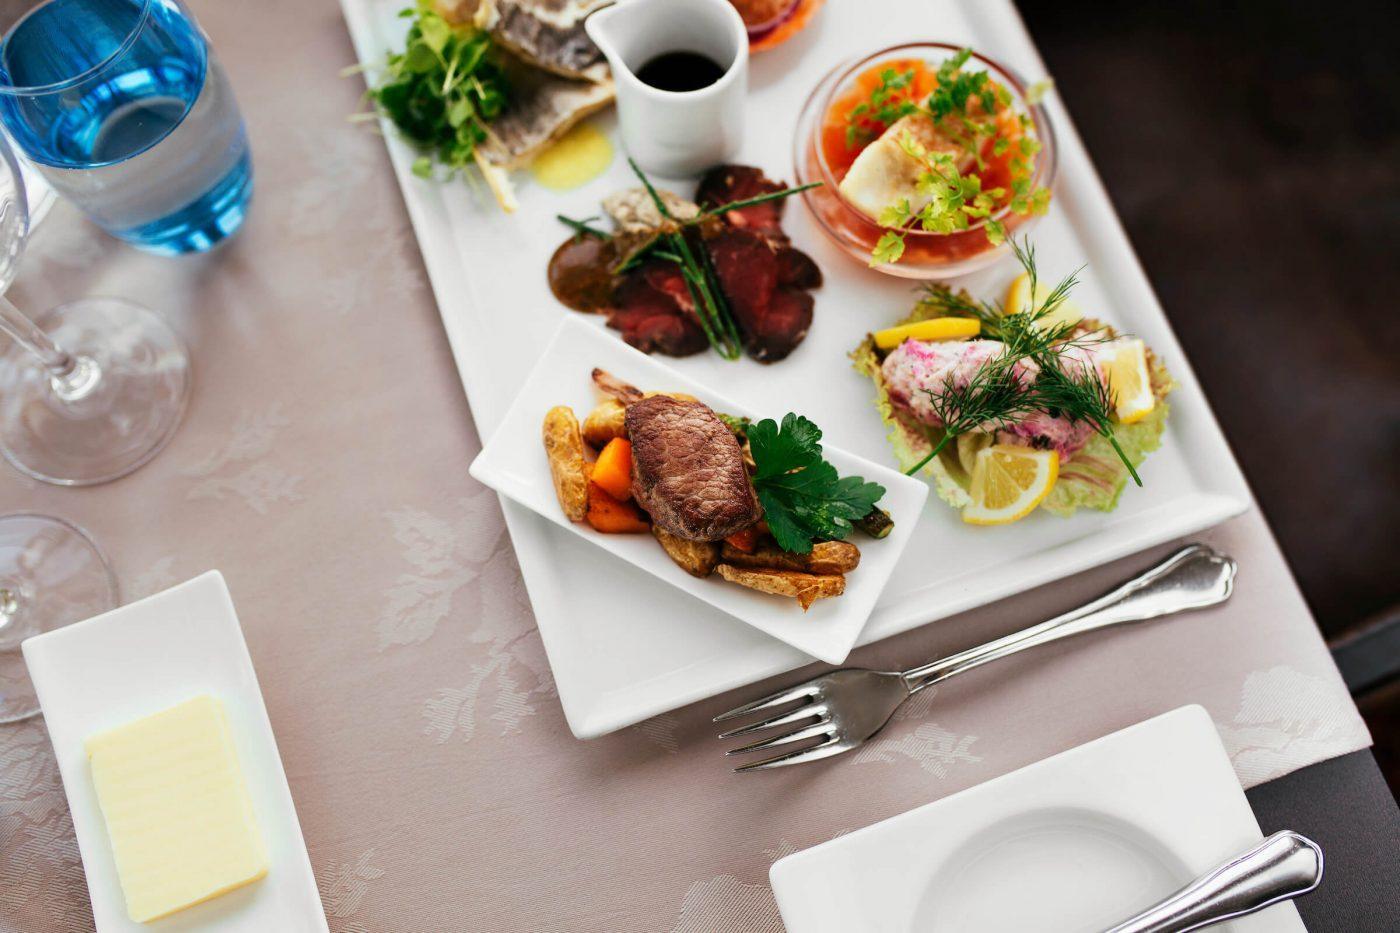 Greenlandic food plate from restaurant Sarfalik in Nuuk, Greenland, by Rebecca